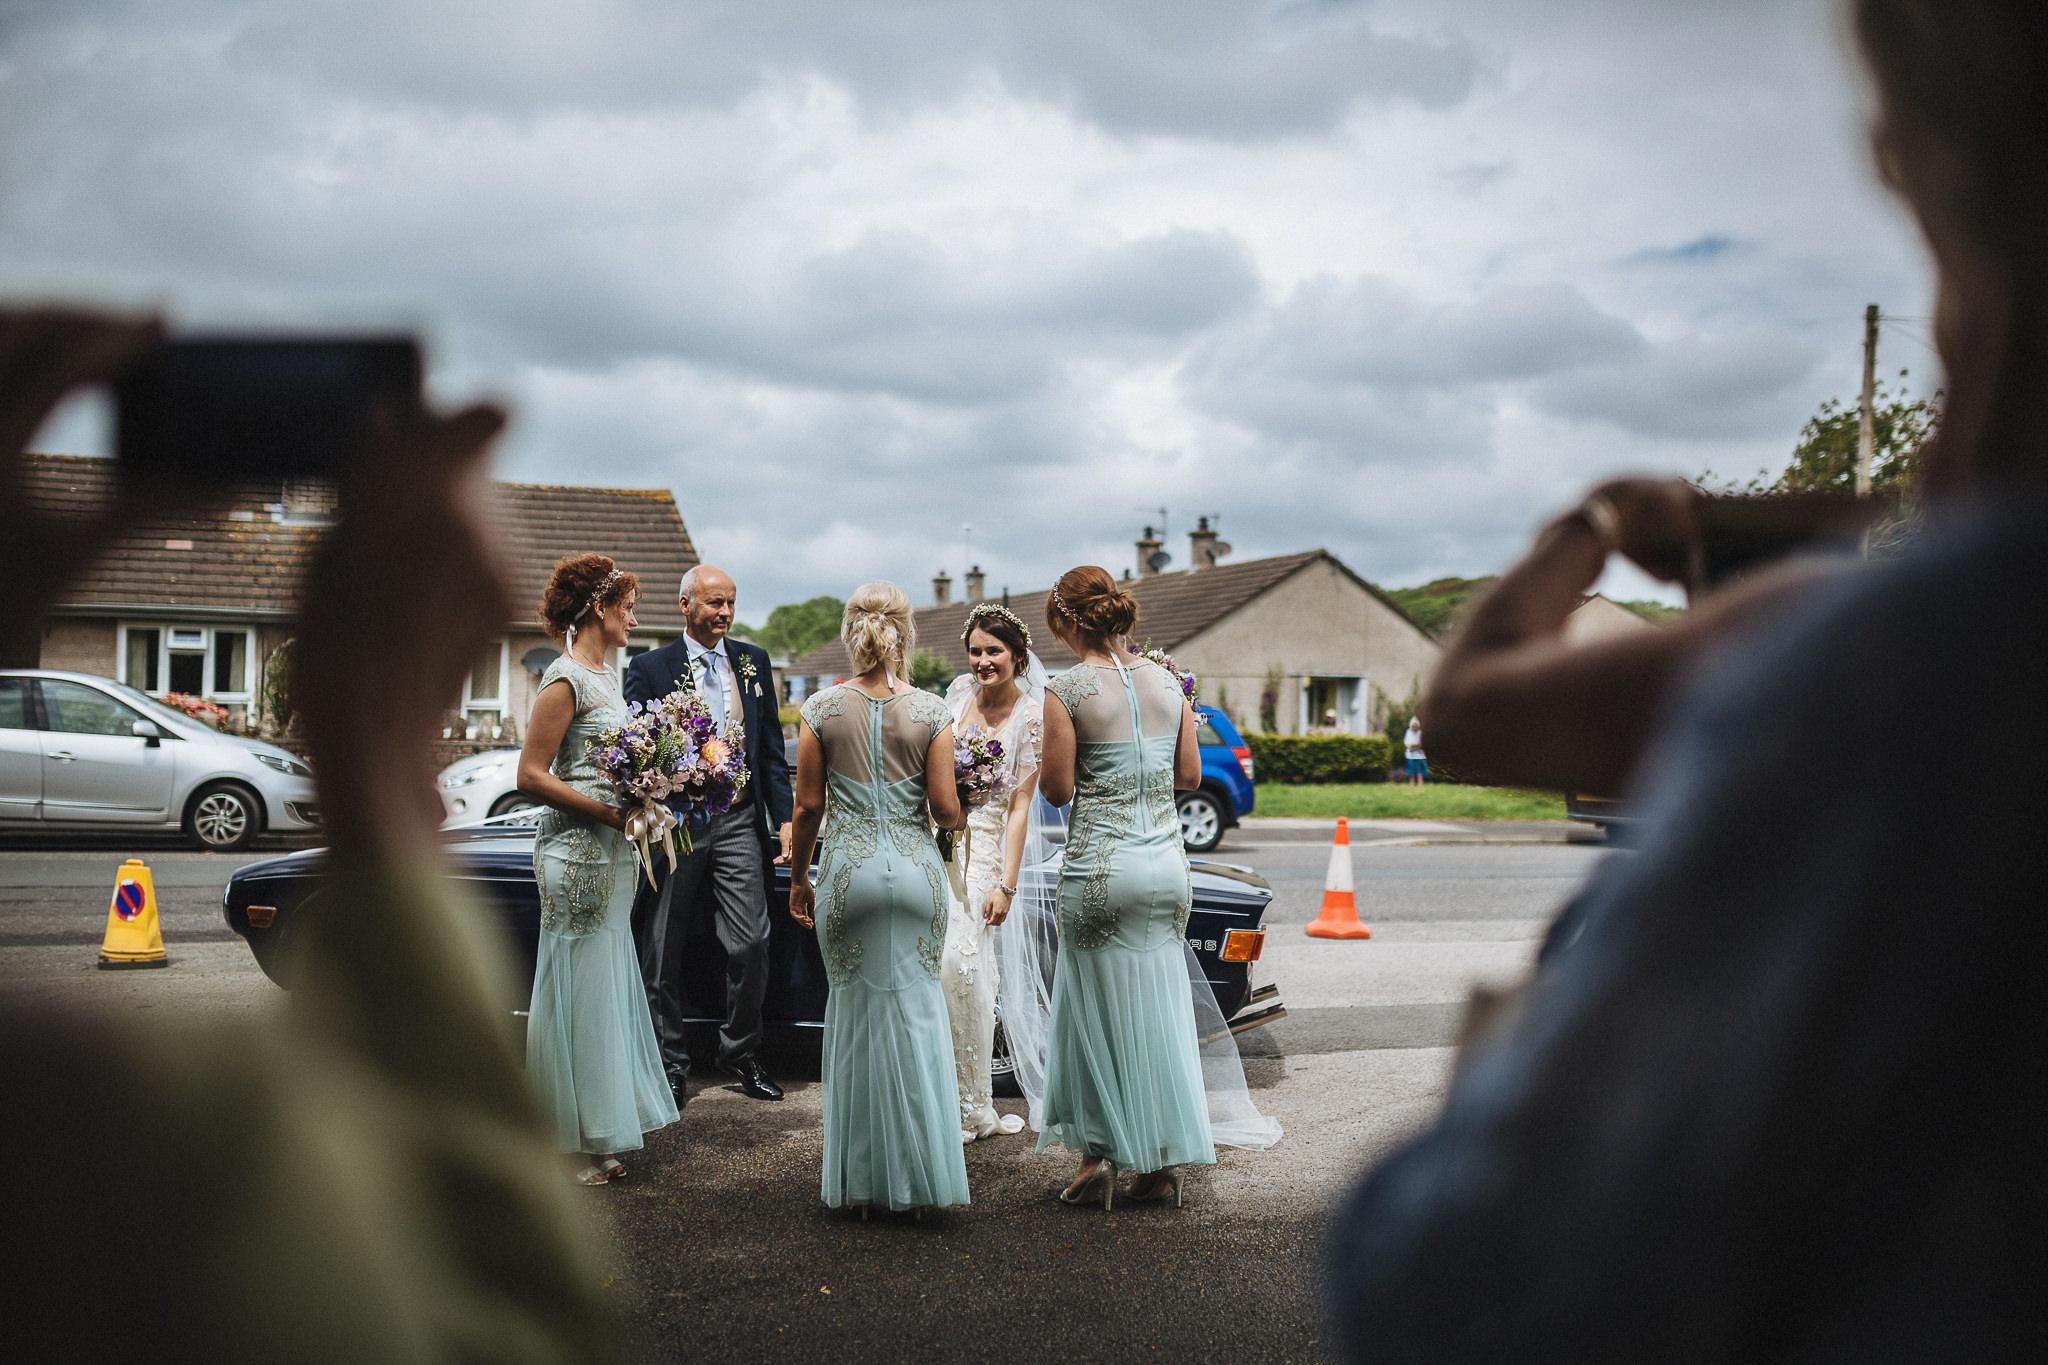 paul-marbrook-Farm-Wedding-Photographer-Lancashire-90023